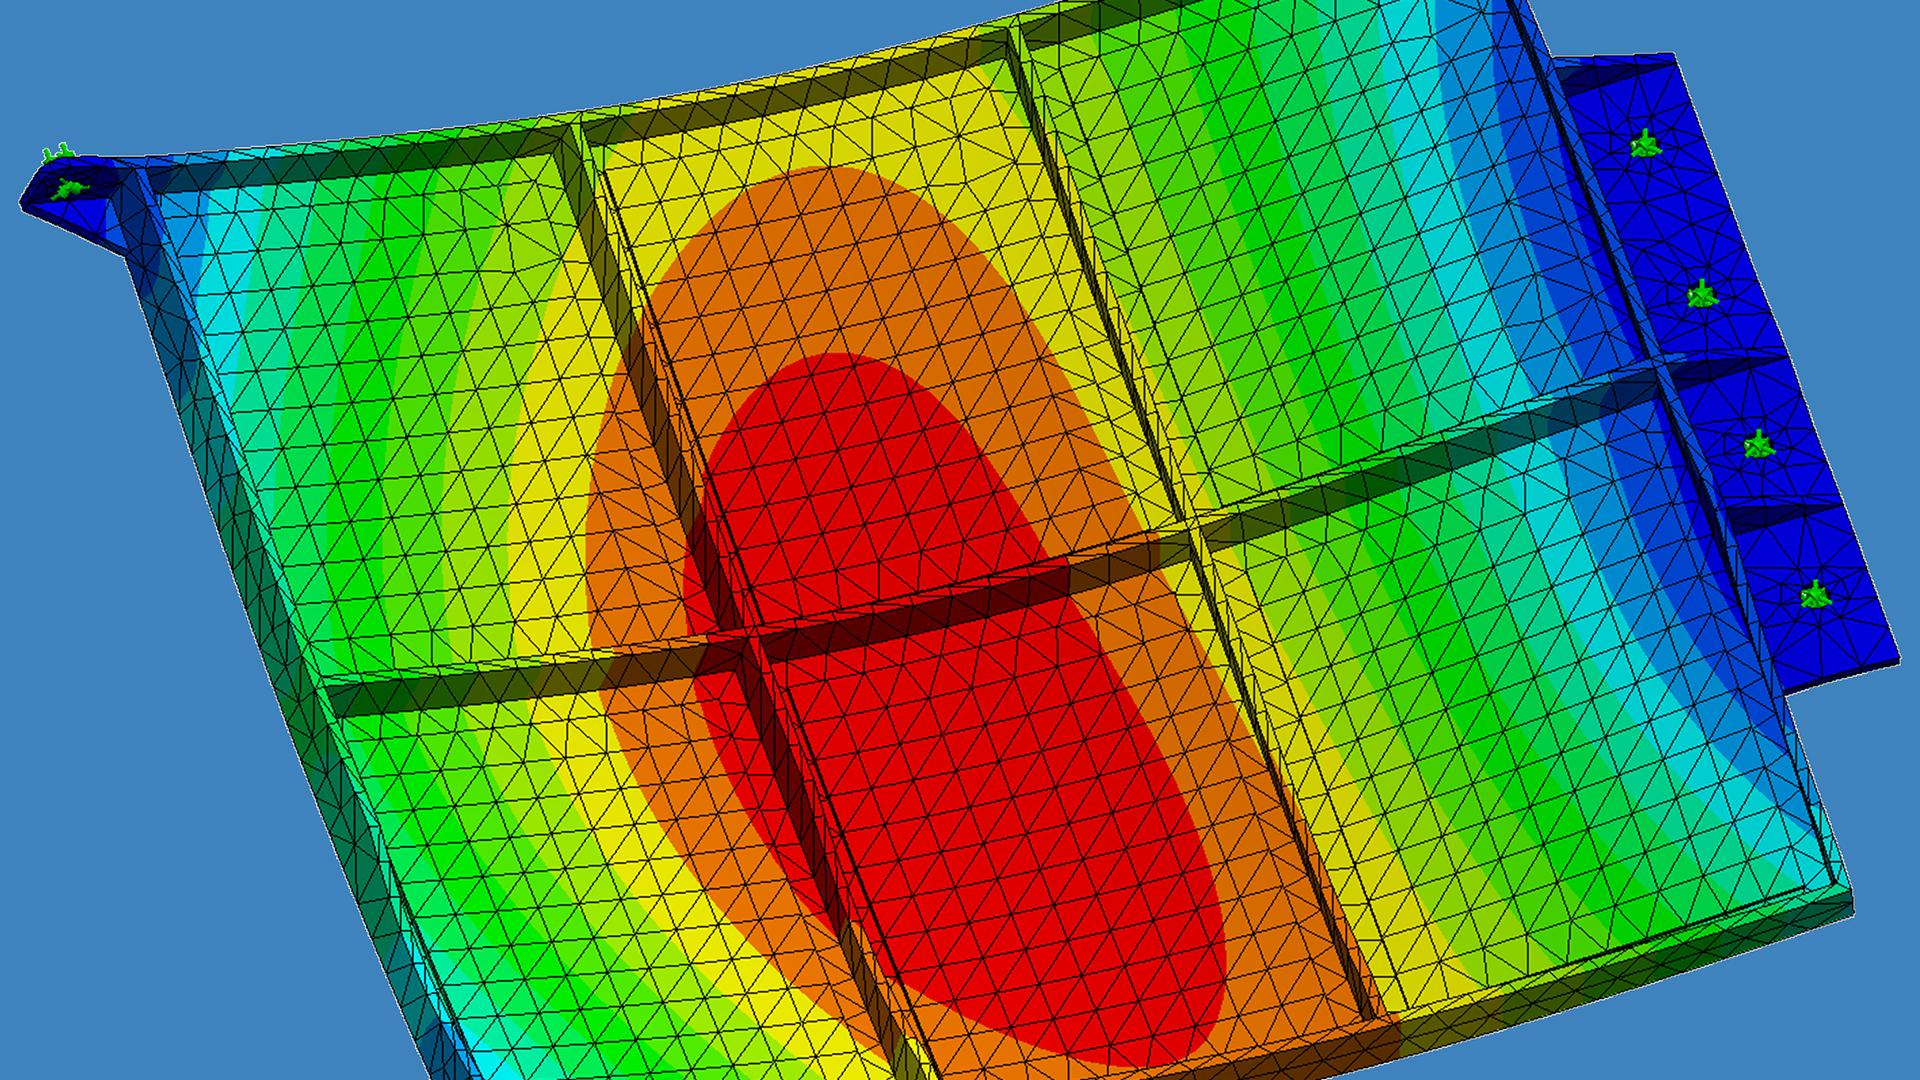 SOLIDWORKS Simulation: Dynamic Analysis